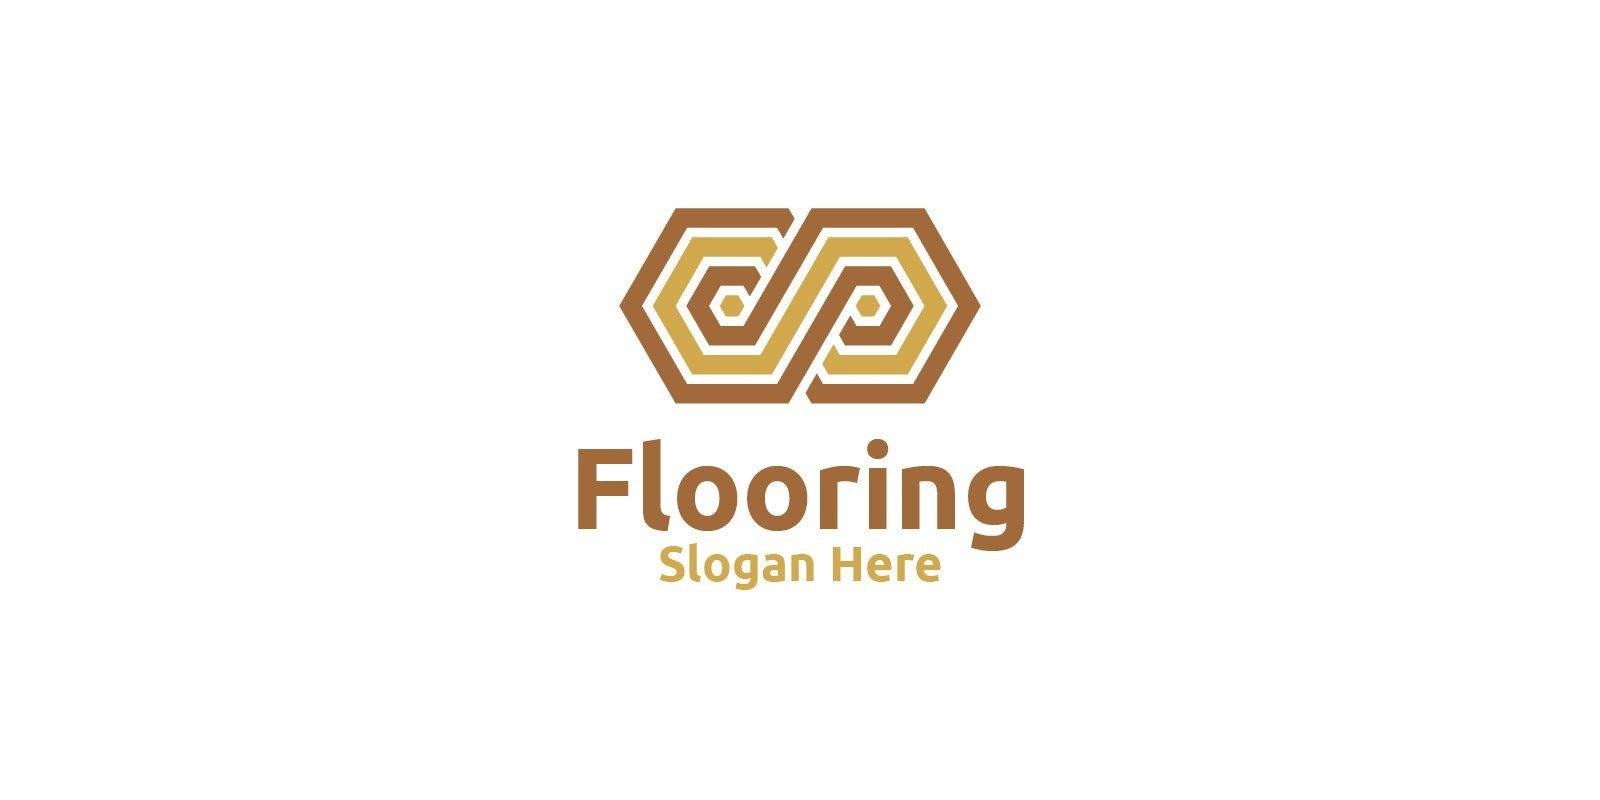 Flooring Parquet Wooden Logo - Graphics